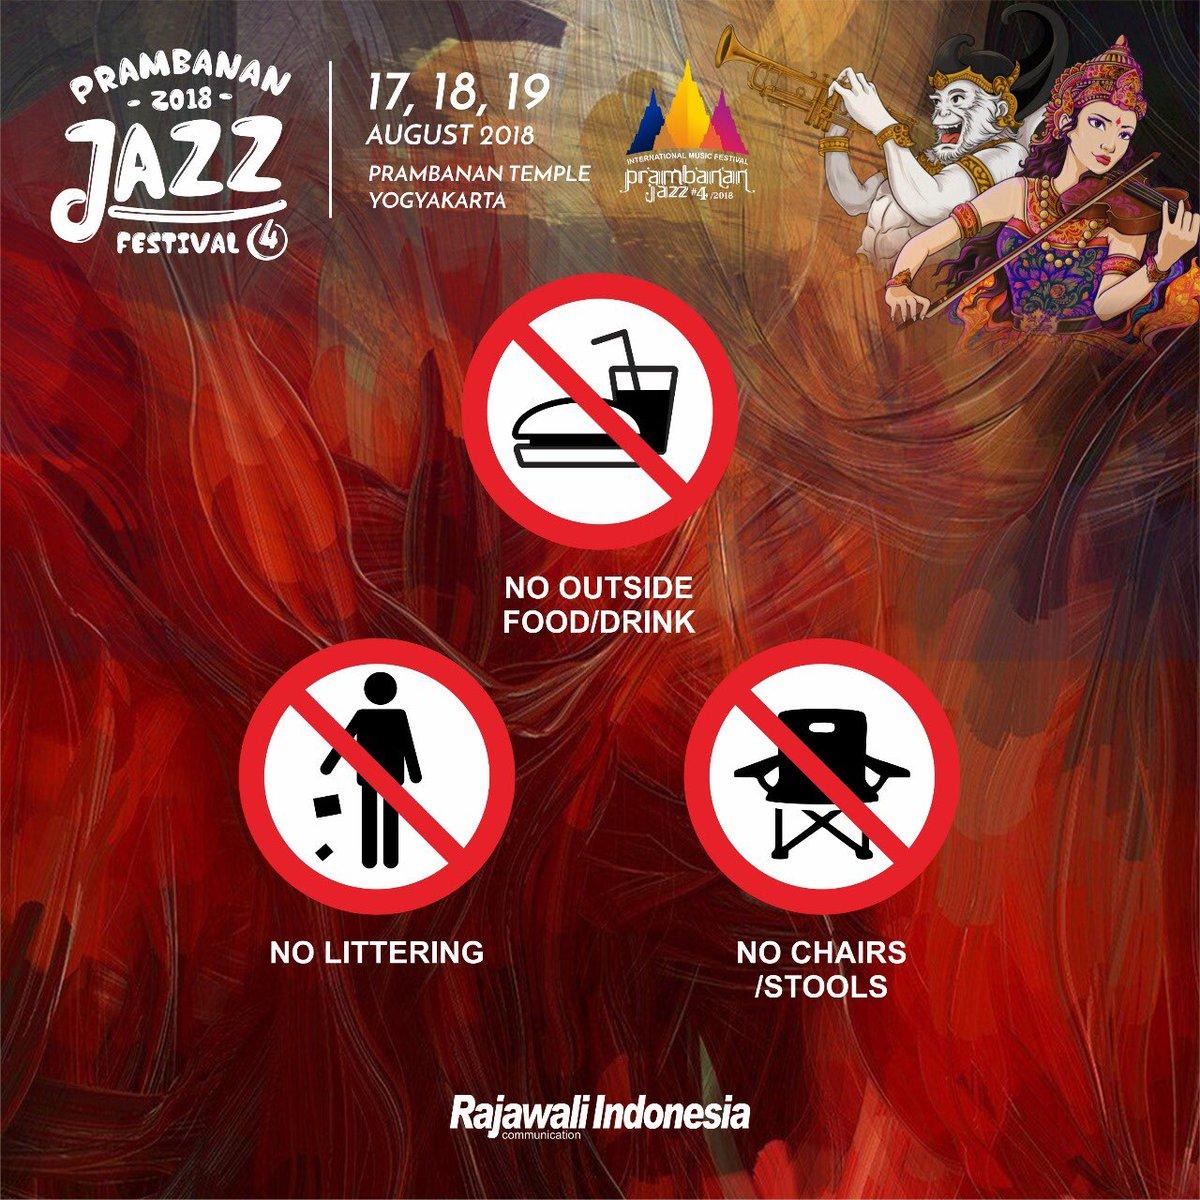 Prambanan Jazz 6 2020 Twitterren Ada Beberapa Peraturan Dalam